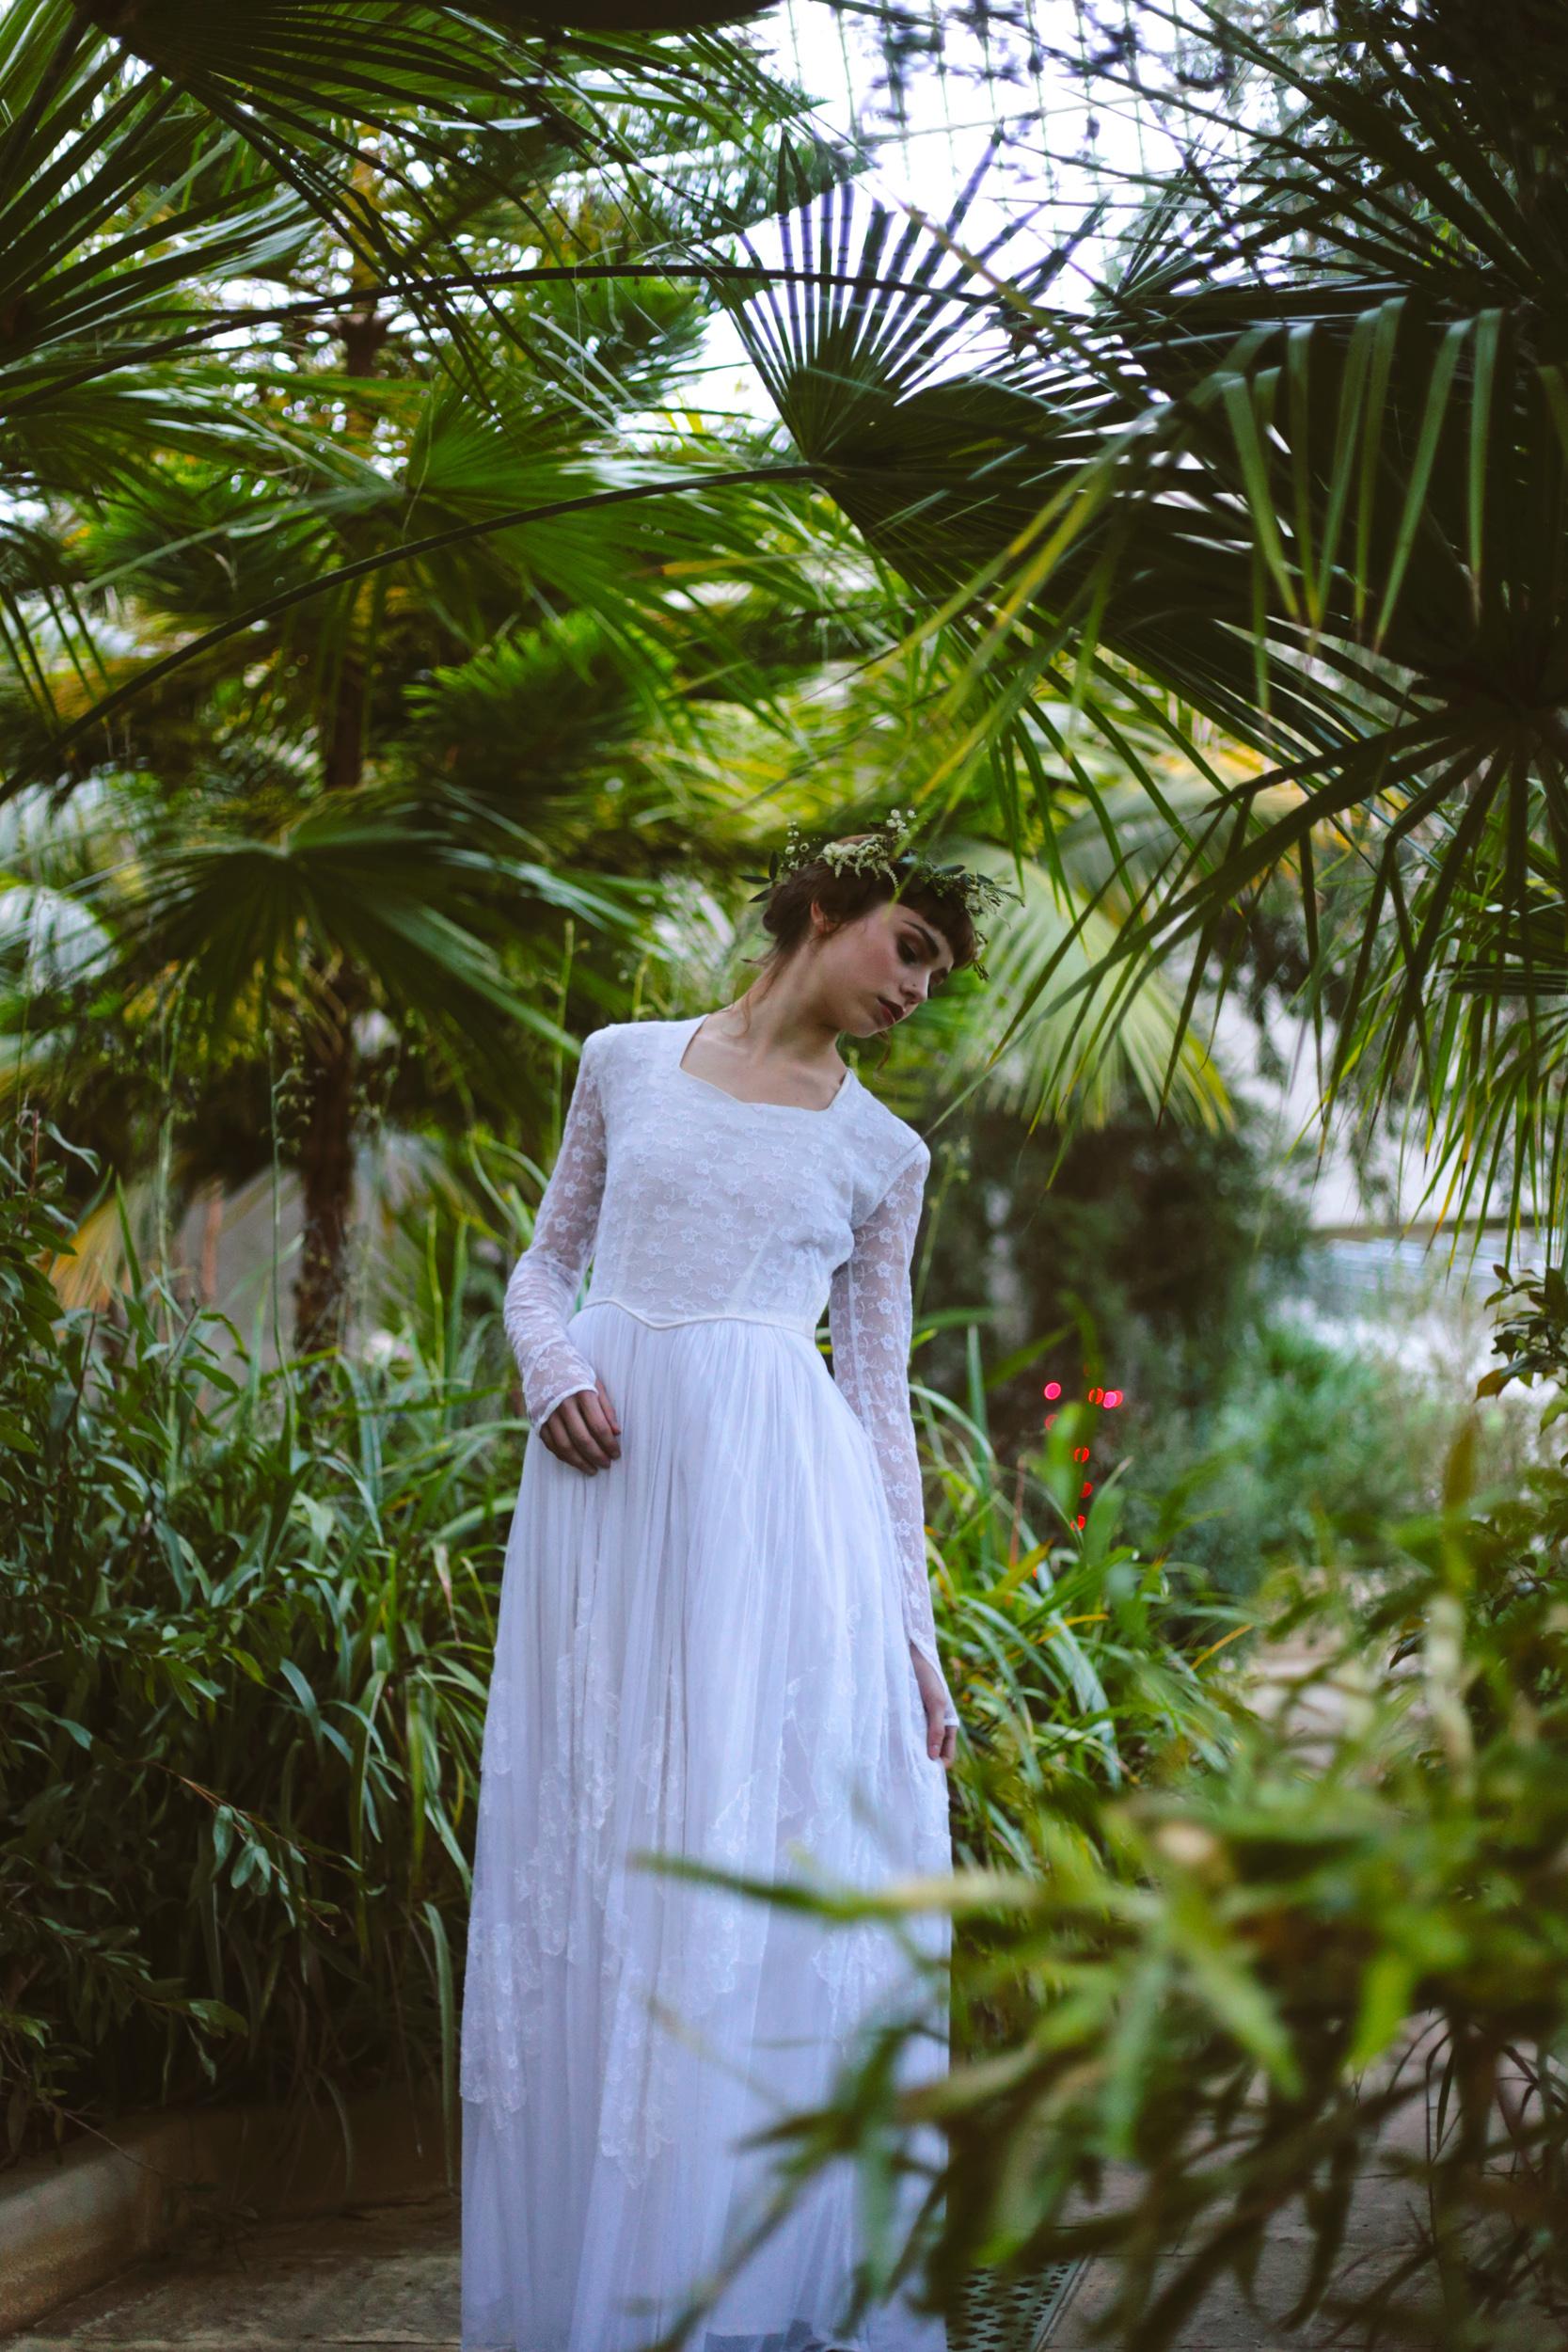 Winter-Bridal-Kate-Beaumont-Shelley-Richmond-Vintage-Wedding-Dress-18.jpg